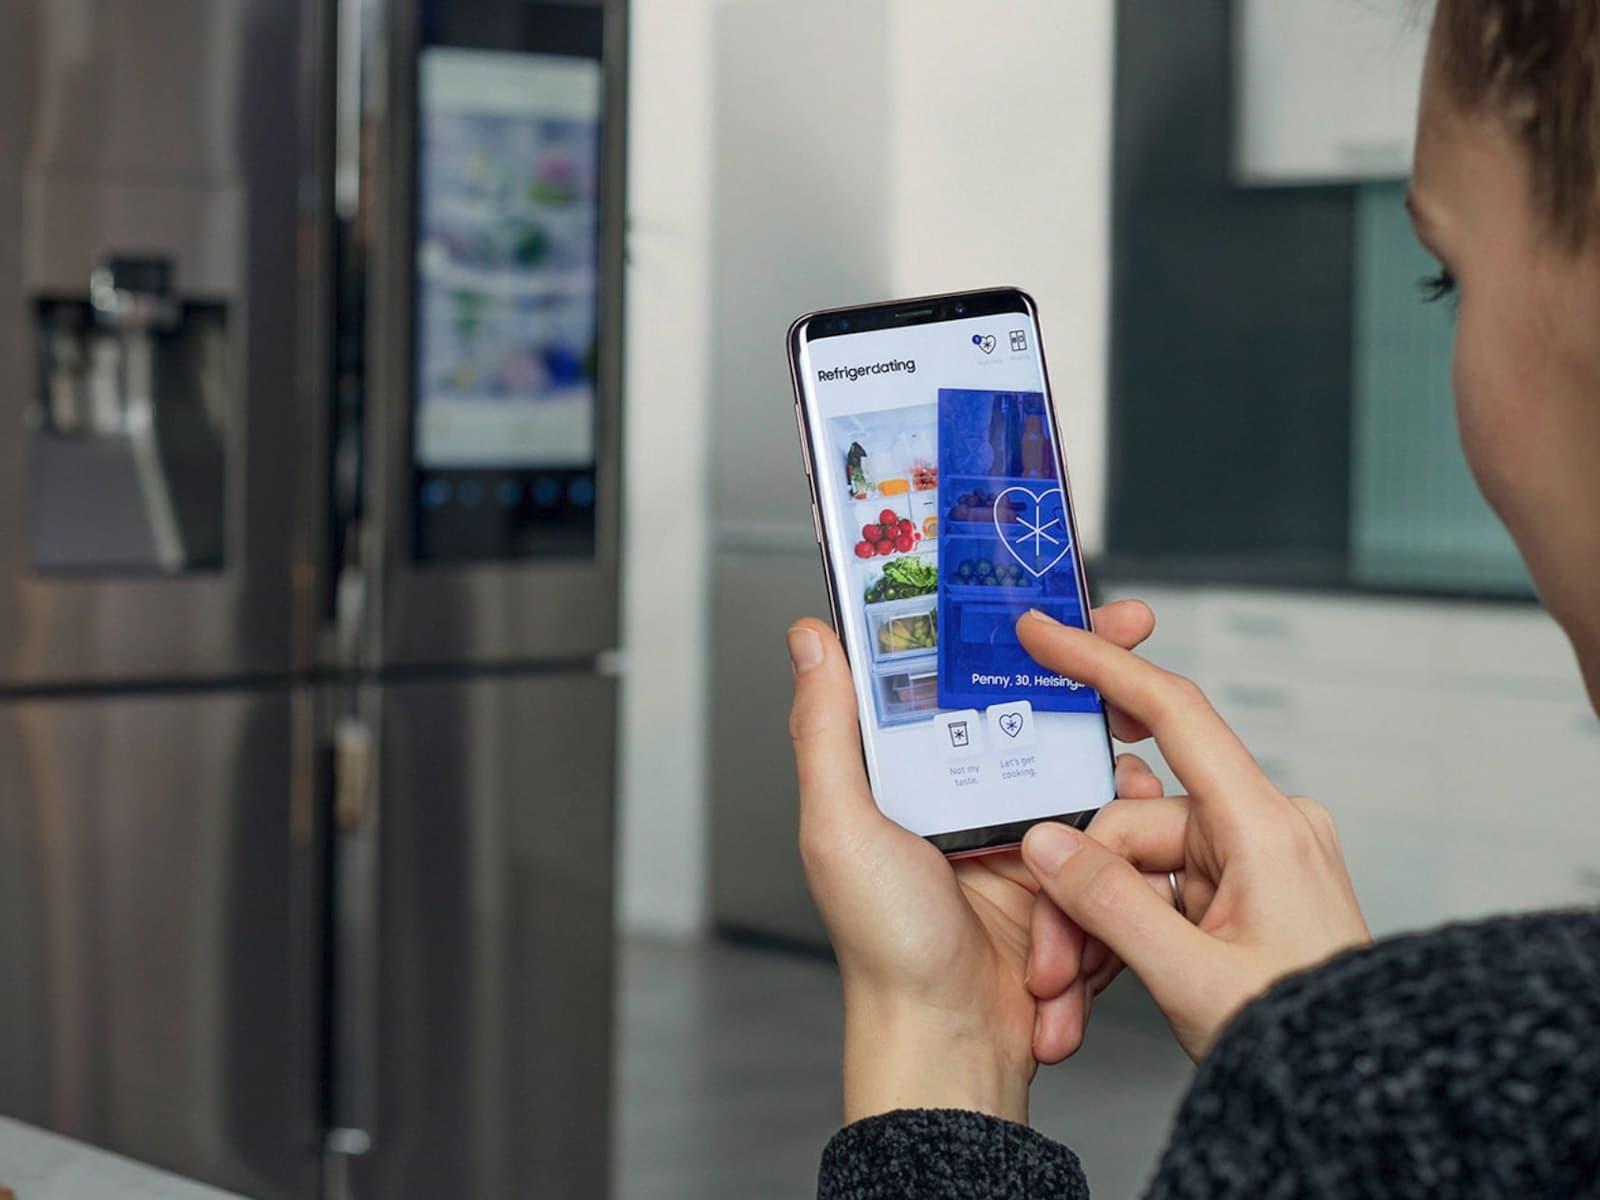 Samsung's Awkward 'Refrigerdating' App Brings Food & Love Closer